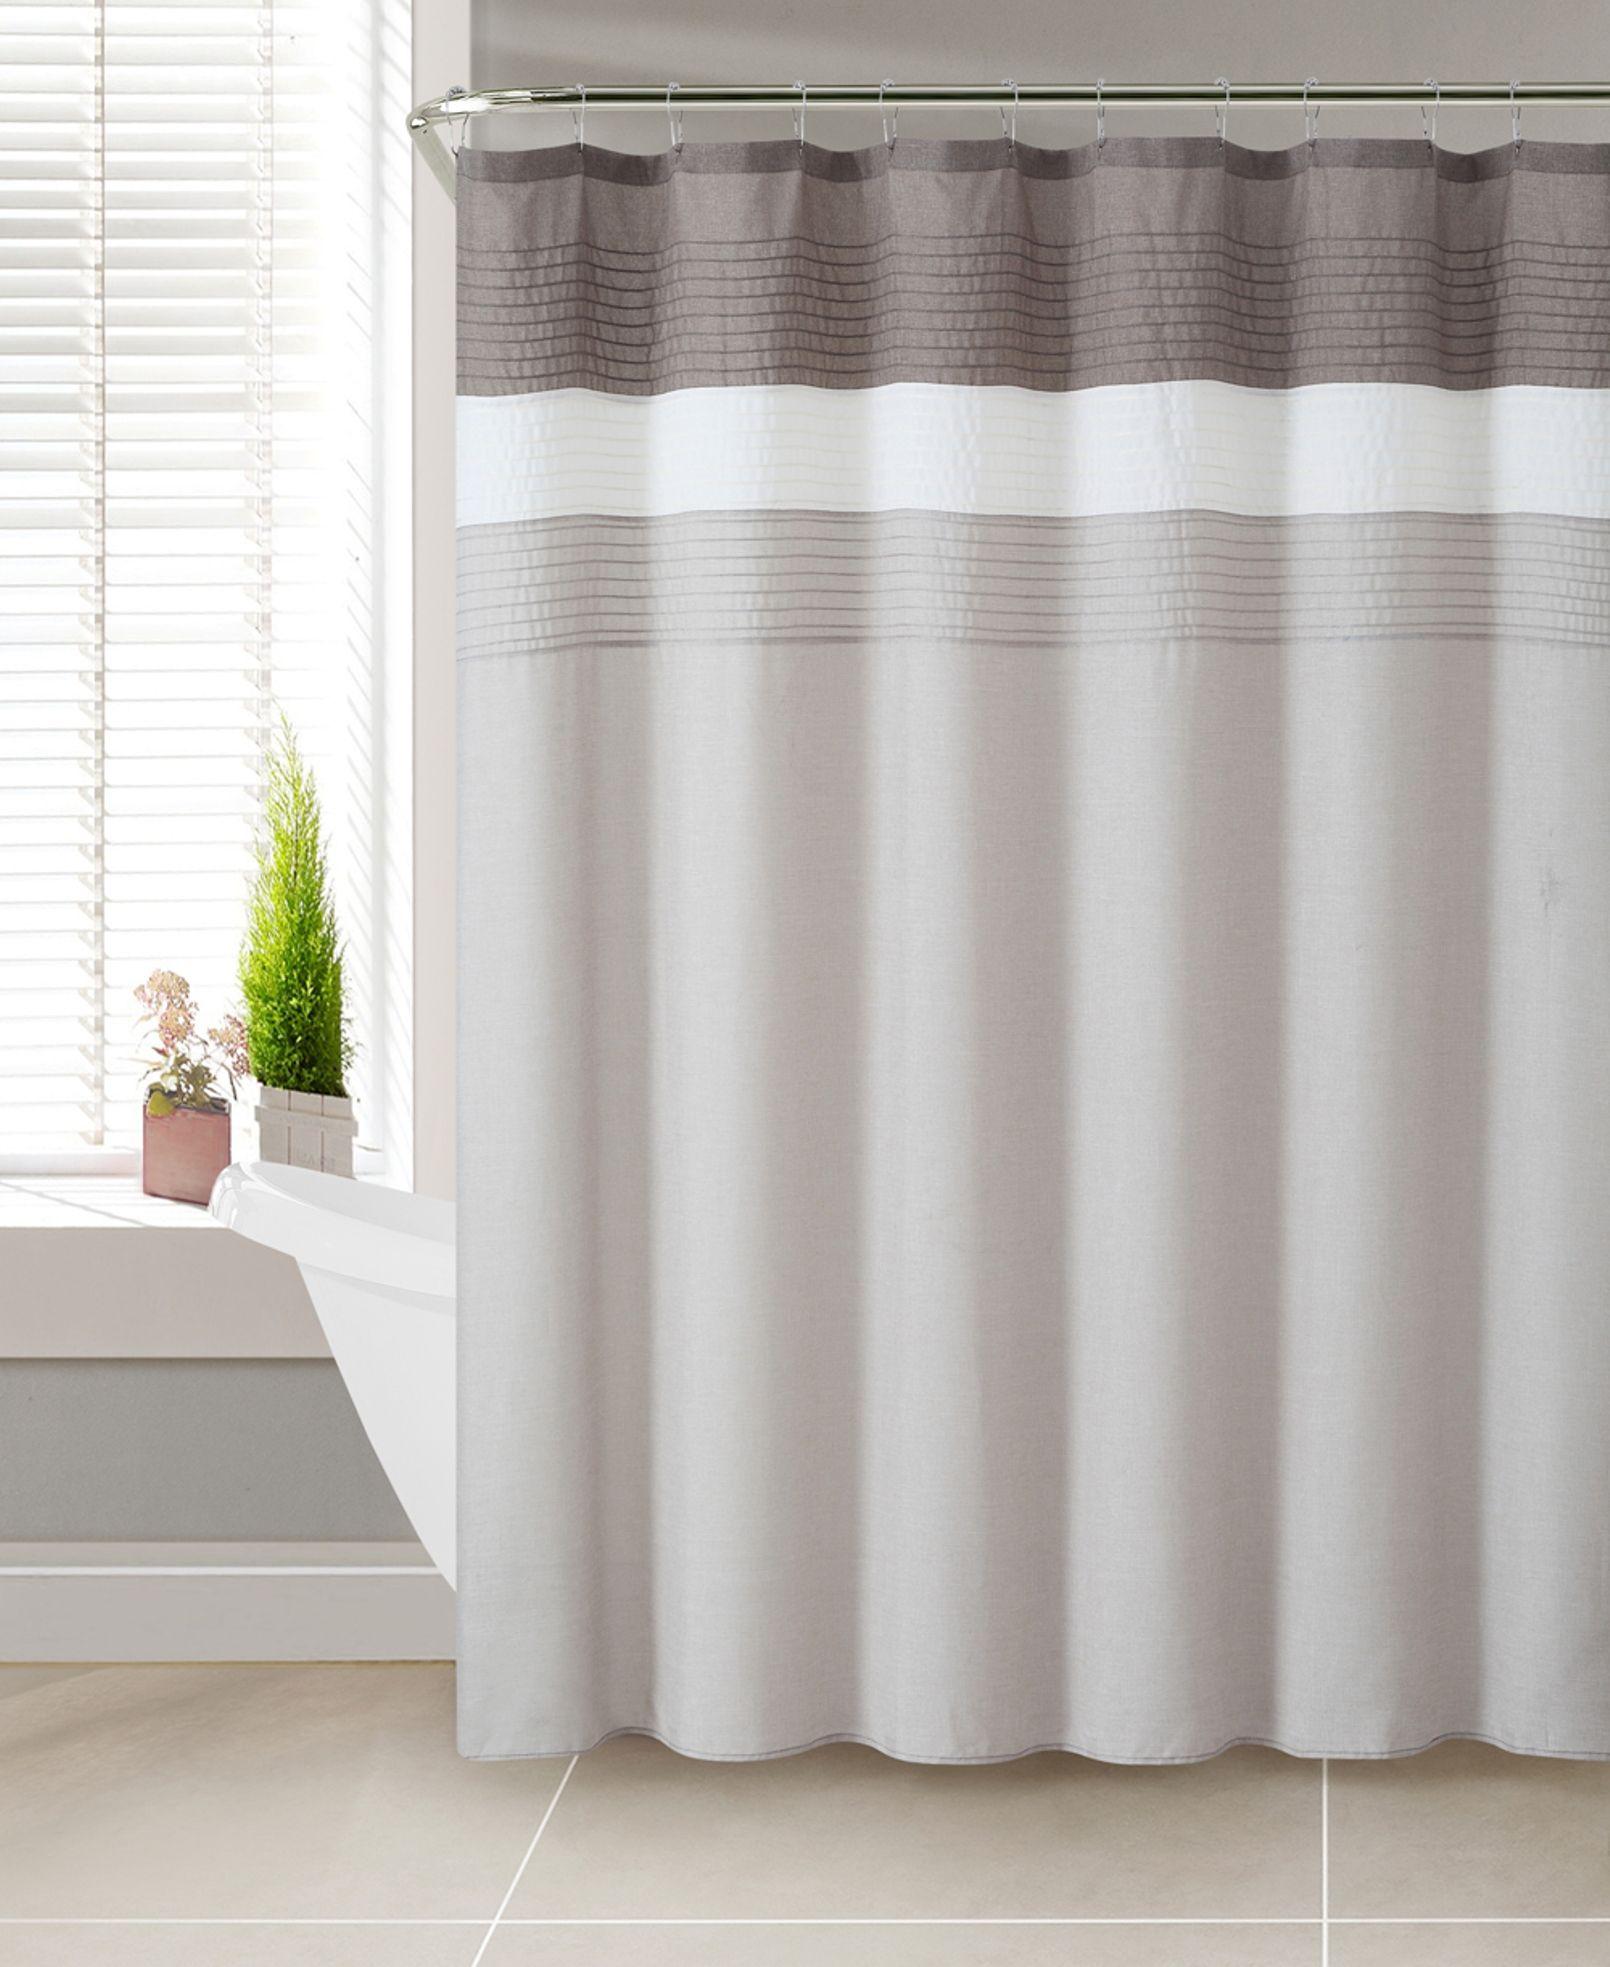 Colormate Regan Shower Curtain Taupe Beige Tan Grey